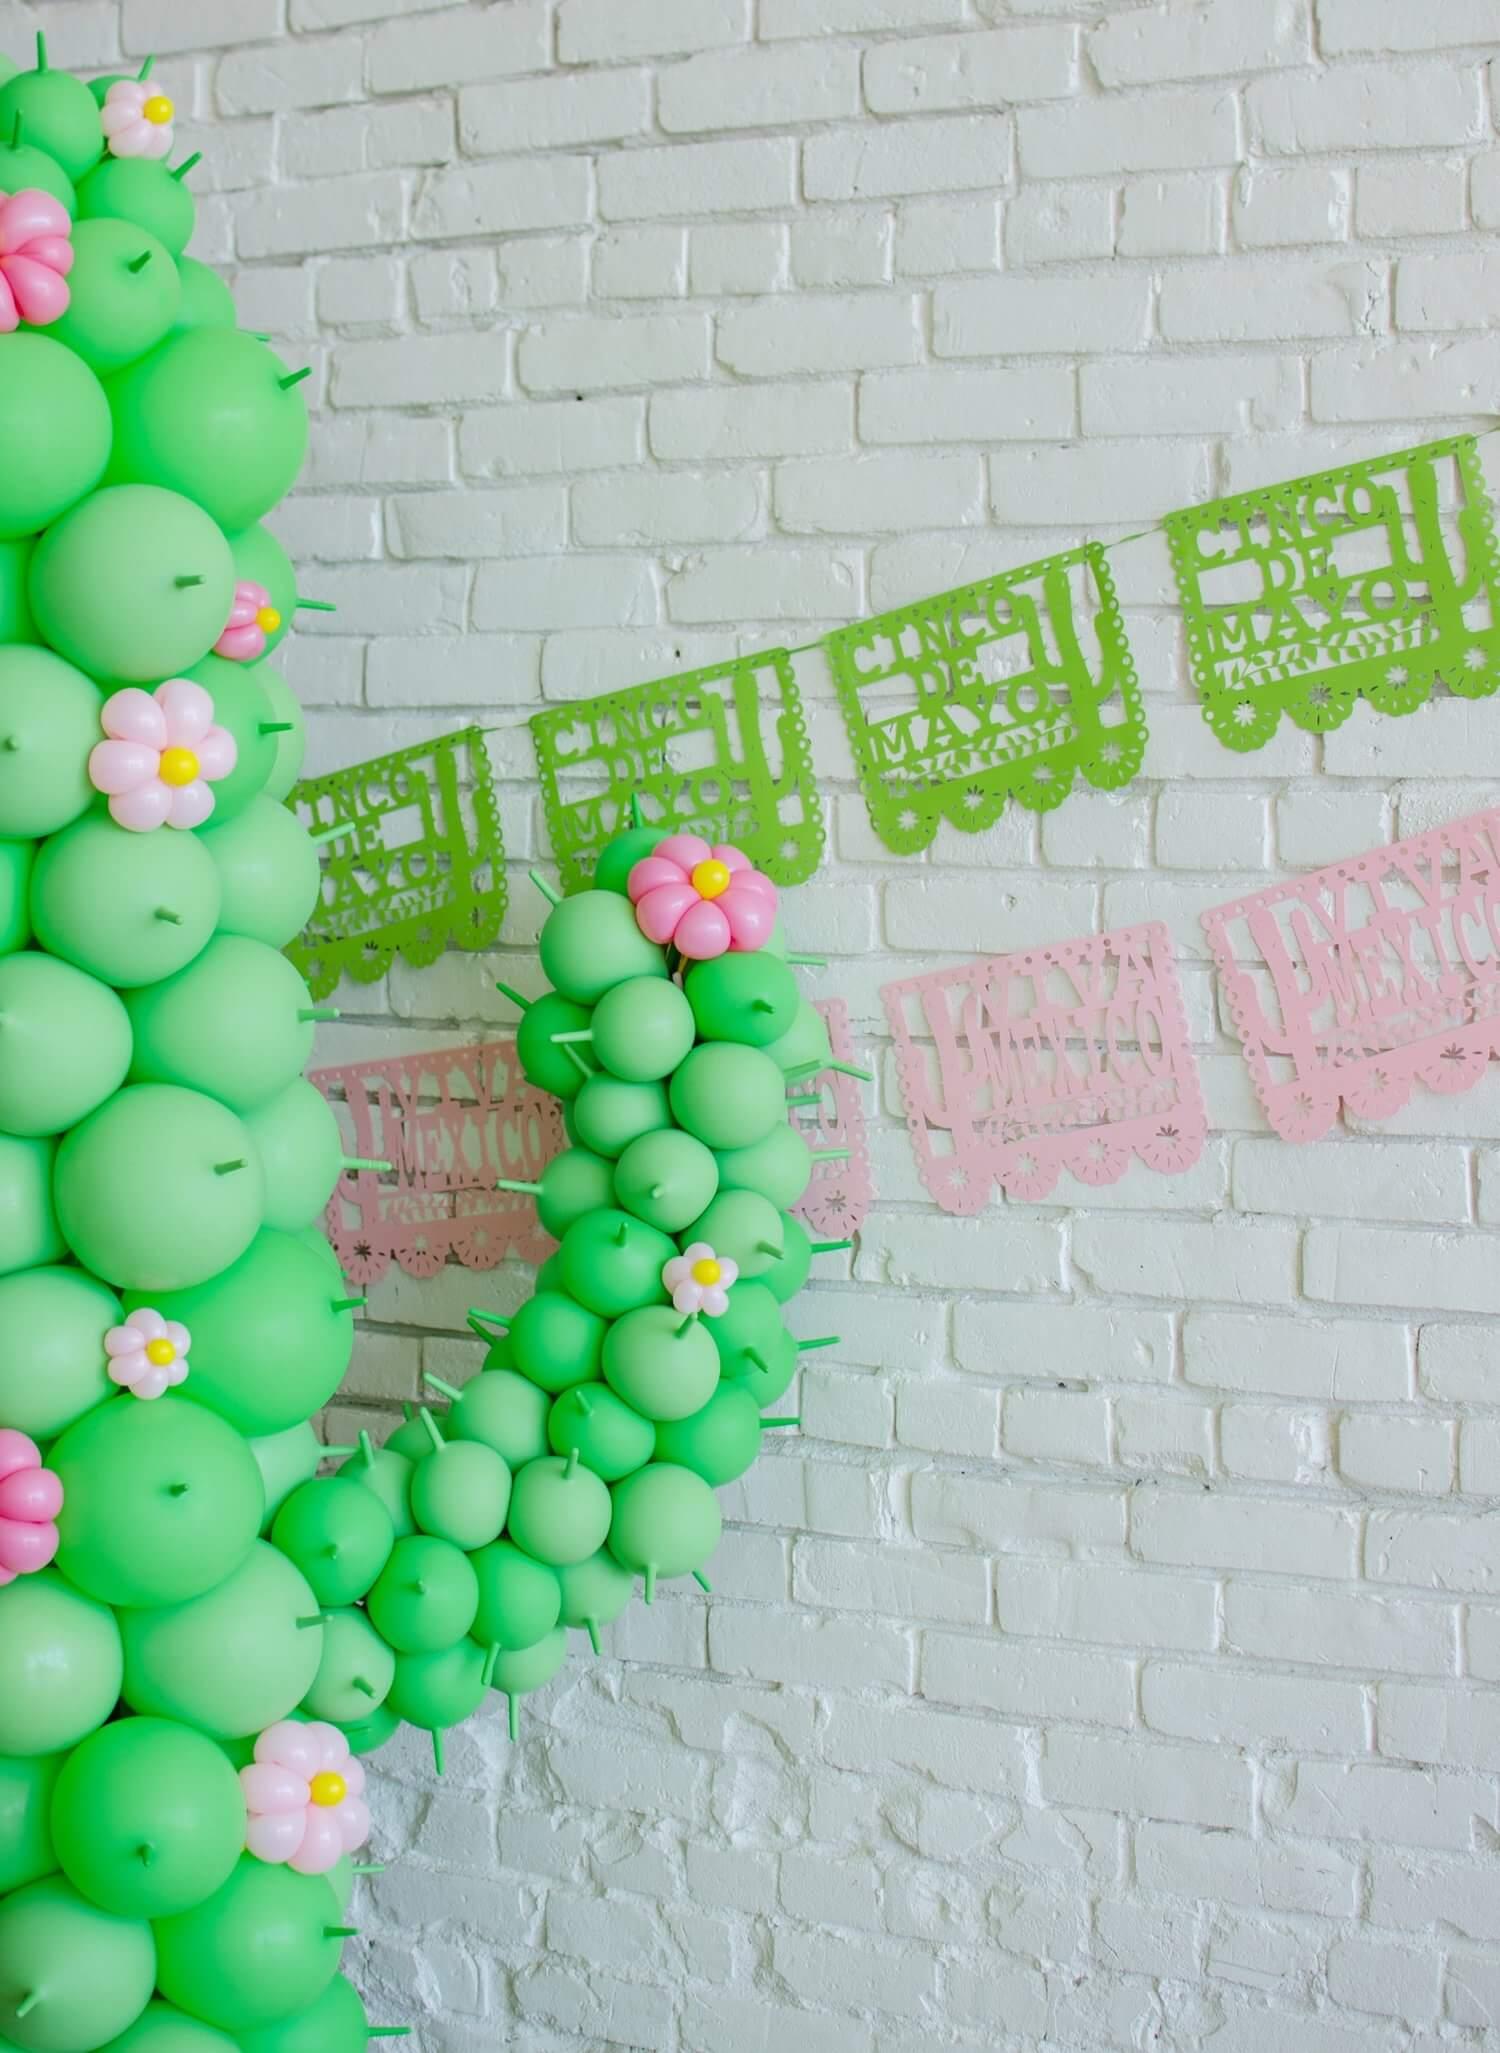 Cinco de Mayo party ideas / Cinco de Mayo Party decor / Papel Picado decor / Balloon Art / Southwestern party ideas / Styled by Carolina from MINT Event Design / www.minteventdesign.com